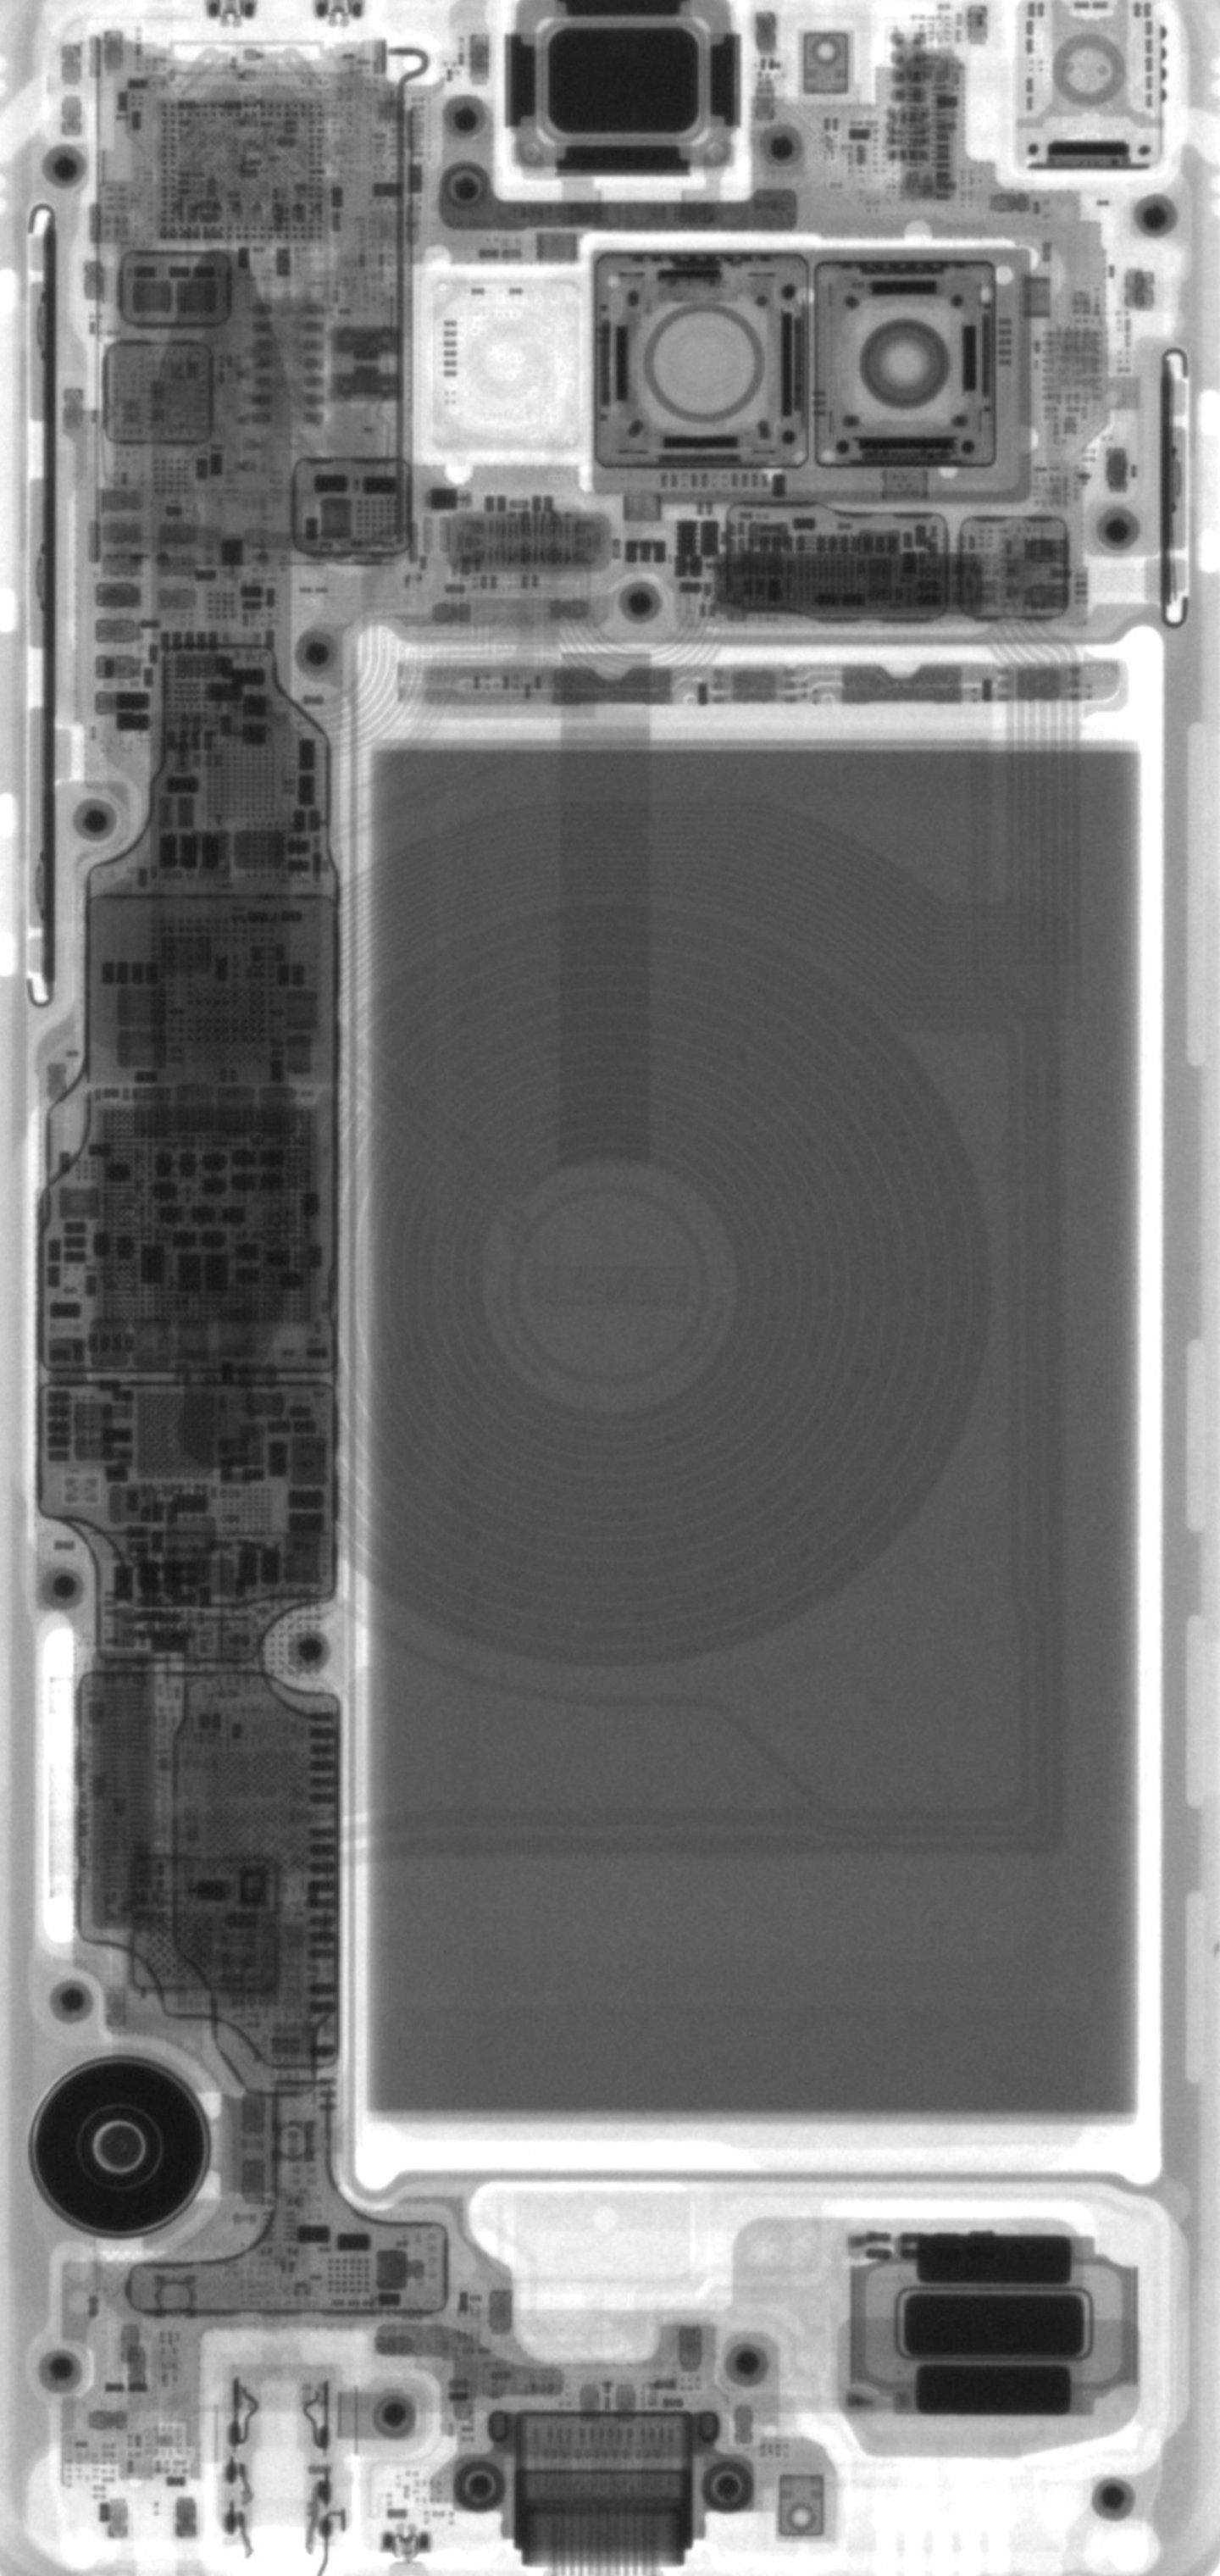 Samsung Galaxy S10 & S10e Teardown Wallpapers - iFixit